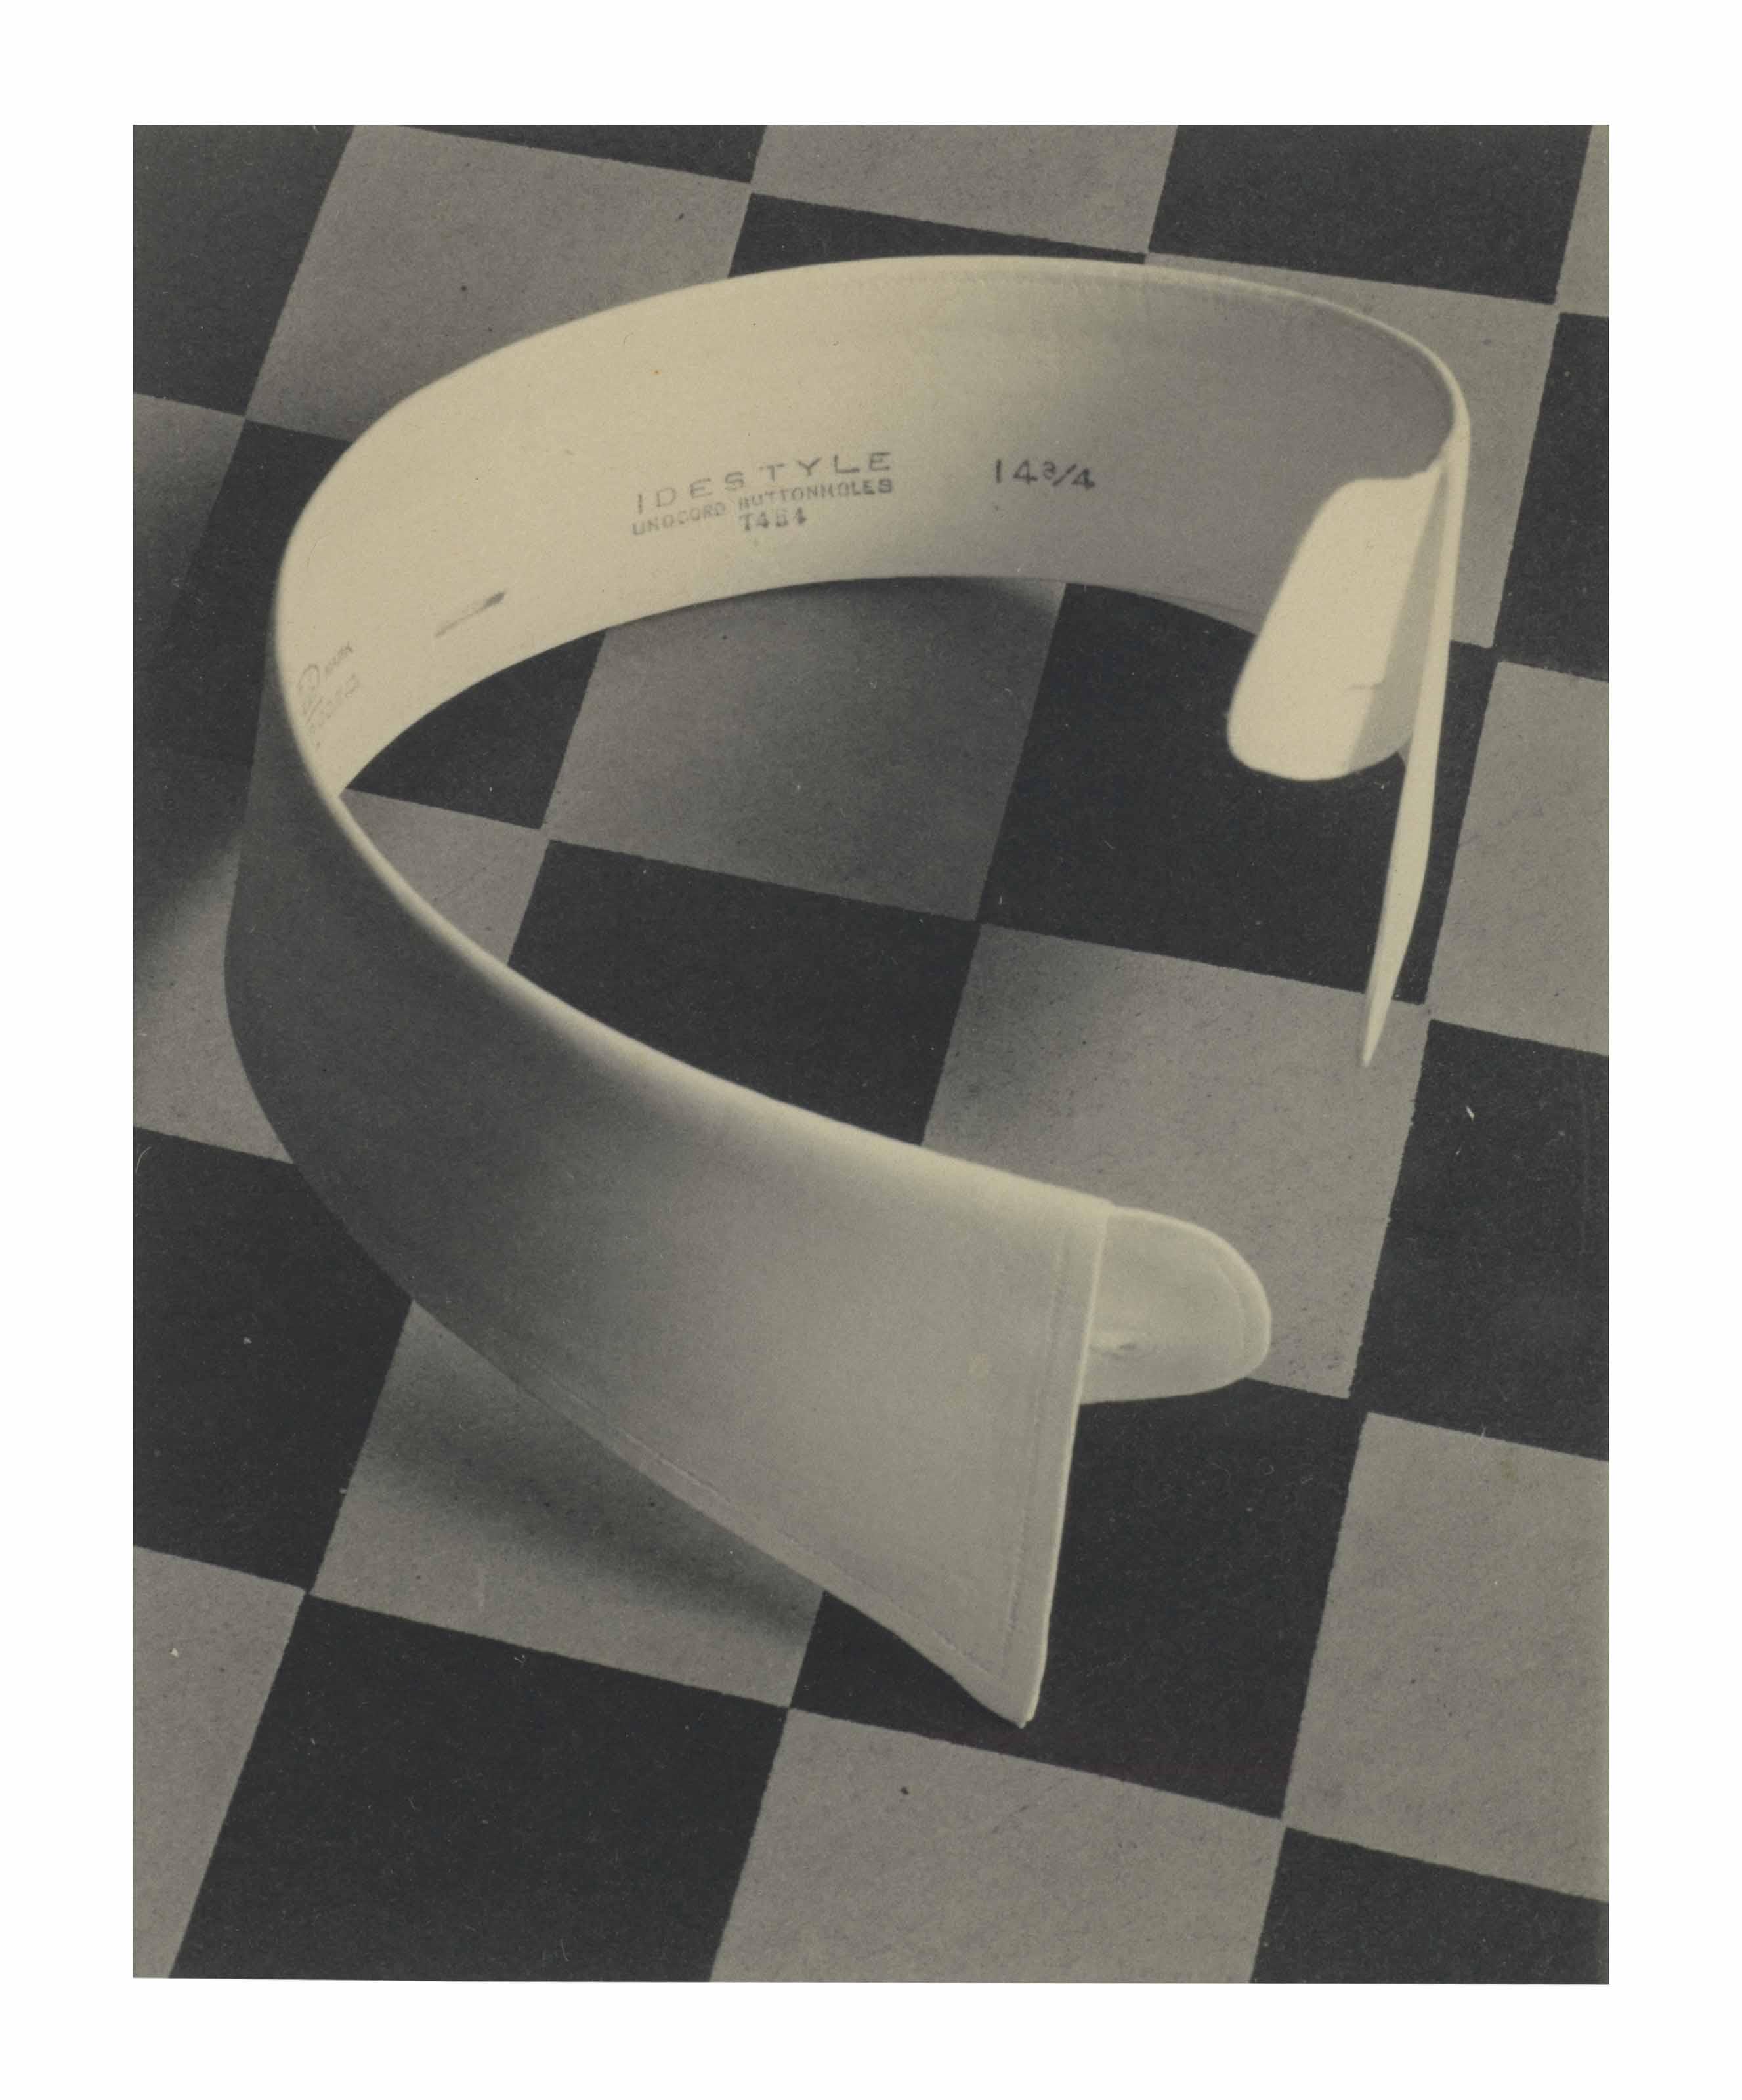 Ide Collar, 1922